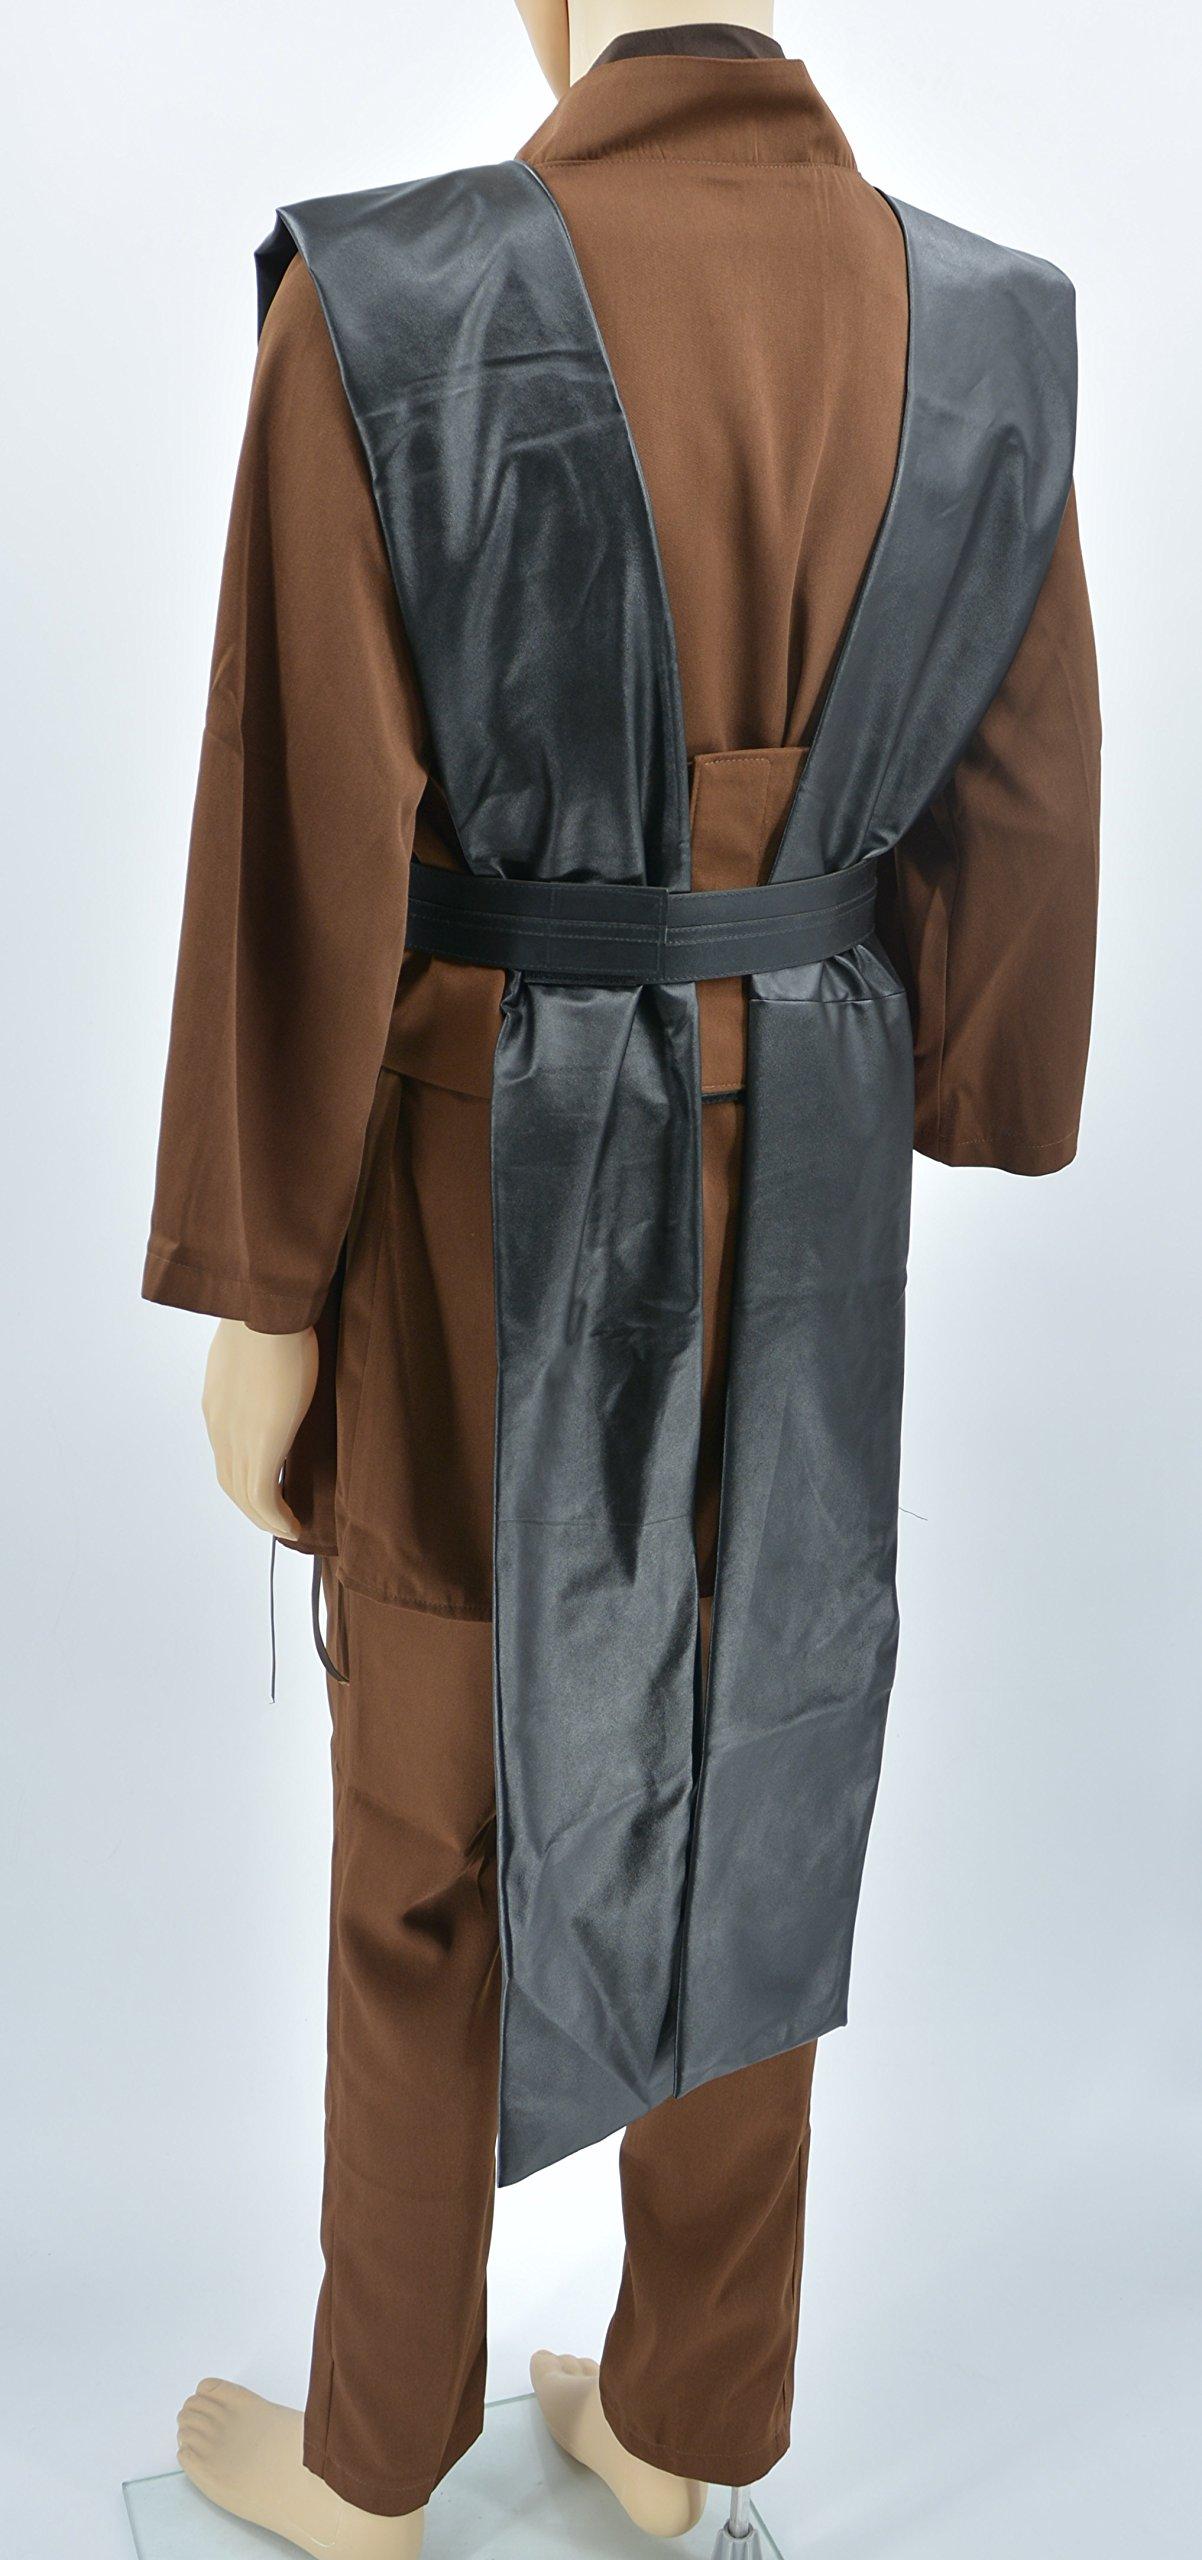 hideaway Star Wars Adult Deluxe Anakin Skywalker Costume [ Size : M, L, XL ] Cosplay (XL) by hideaway (Image #6)